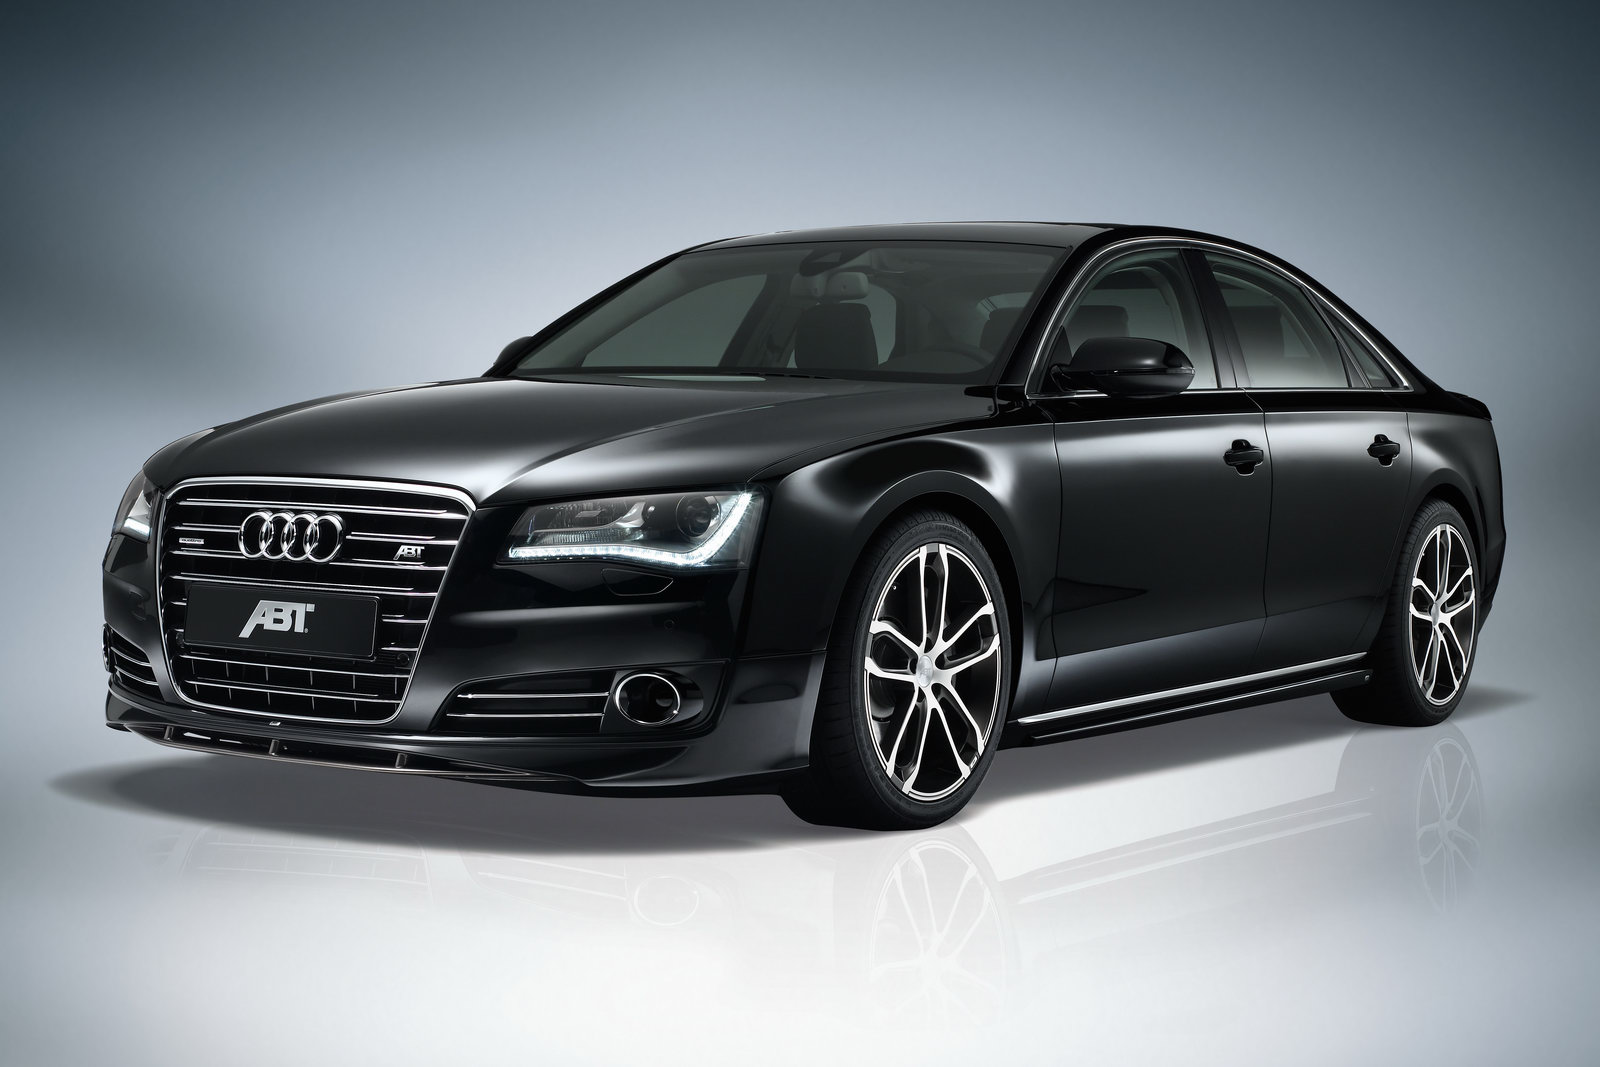 http://4.bp.blogspot.com/_FoXyvaPSnVk/TCOQxdP9NrI/AAAAAAAC_qs/YqedXNKwoTY/s1600/Audi-AS8-ABT-1.jpg